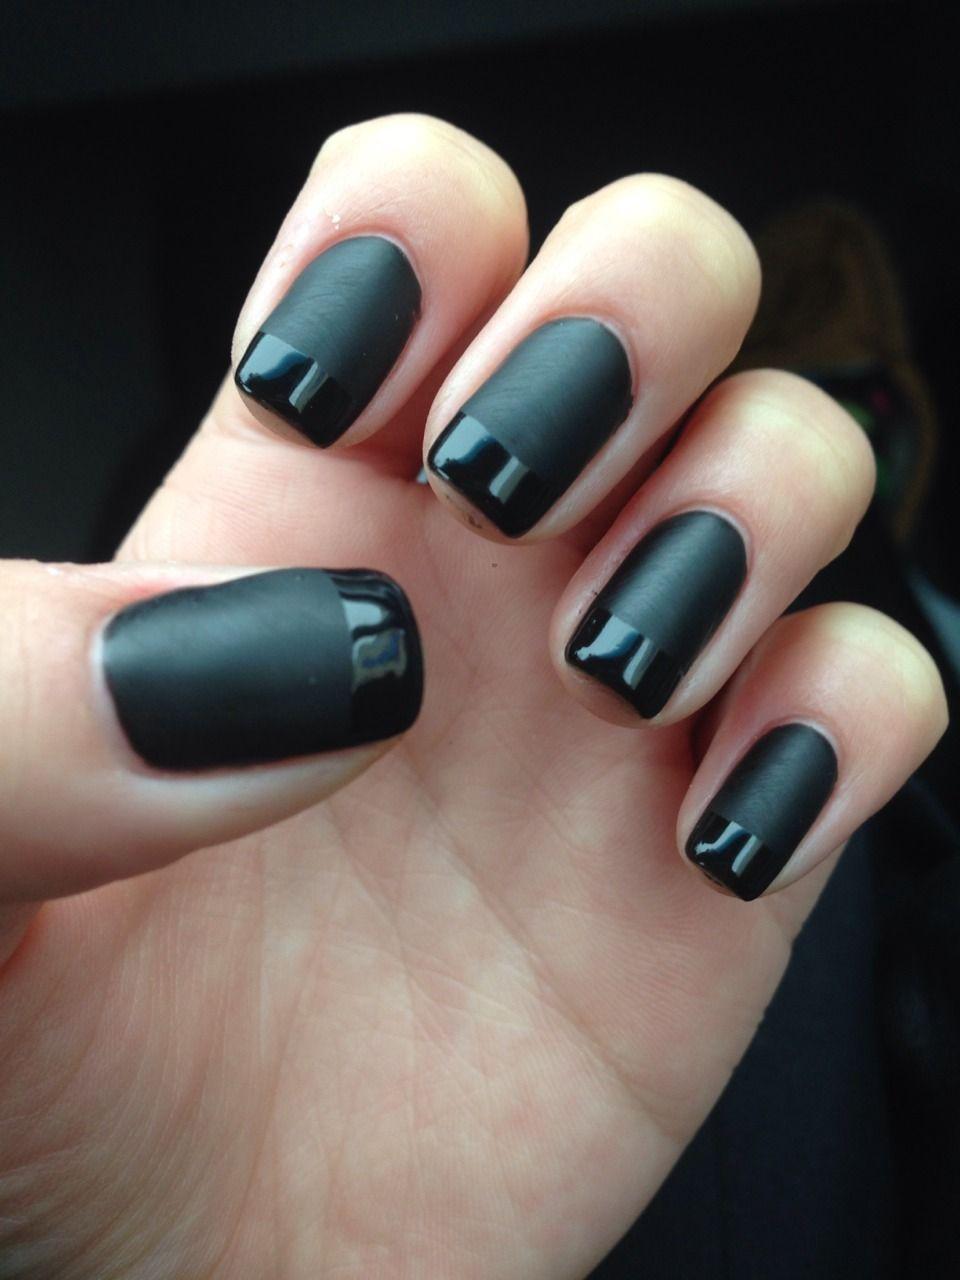 Pin by dreaming 58 on Ebony   Pinterest   Black nail art and Black nails